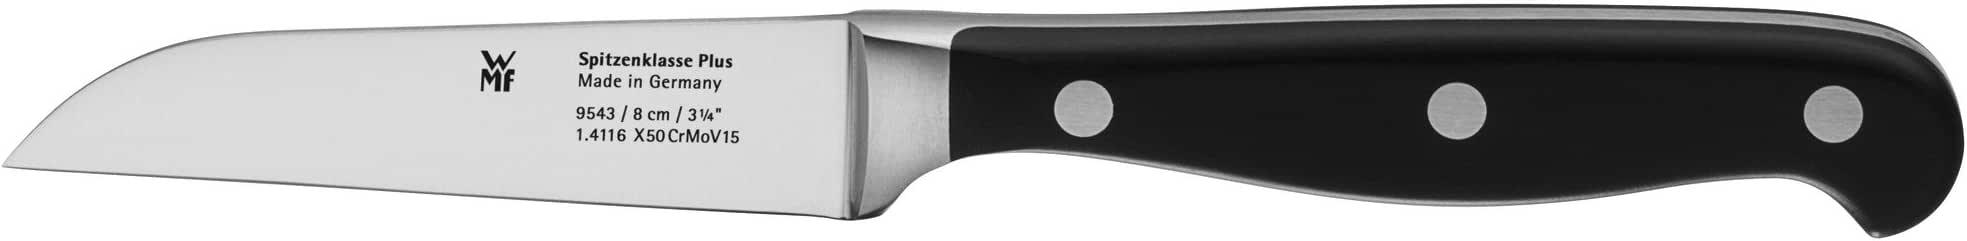 WMF Spitzenklasse Plus Gemüsemesser 18 cm Spezialklingenstahl, Messer geschmiedet, Performance Cut, Kunststoff-Griff vernietet, Klinge 8 cm